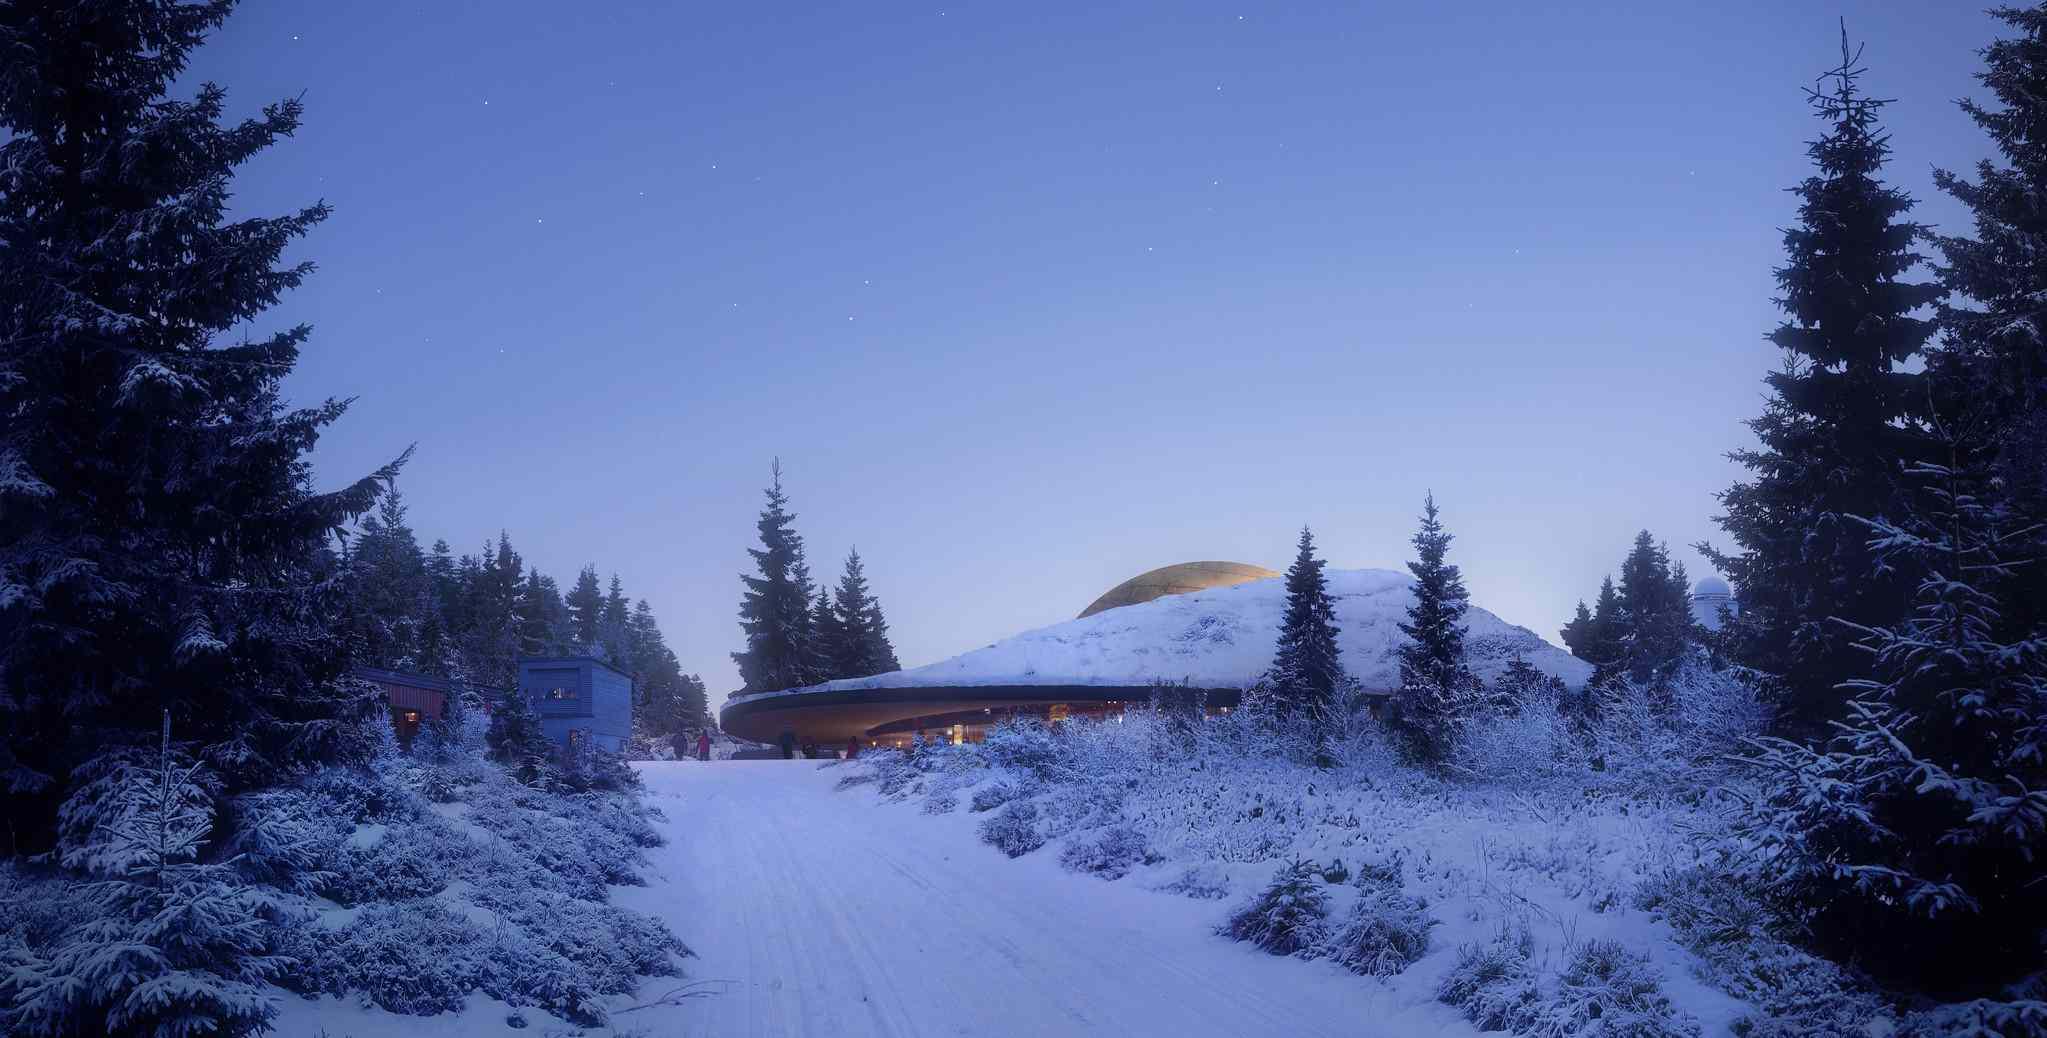 Snow-covered view of revamped Solobservatoriet planetarium Harestua, Norway